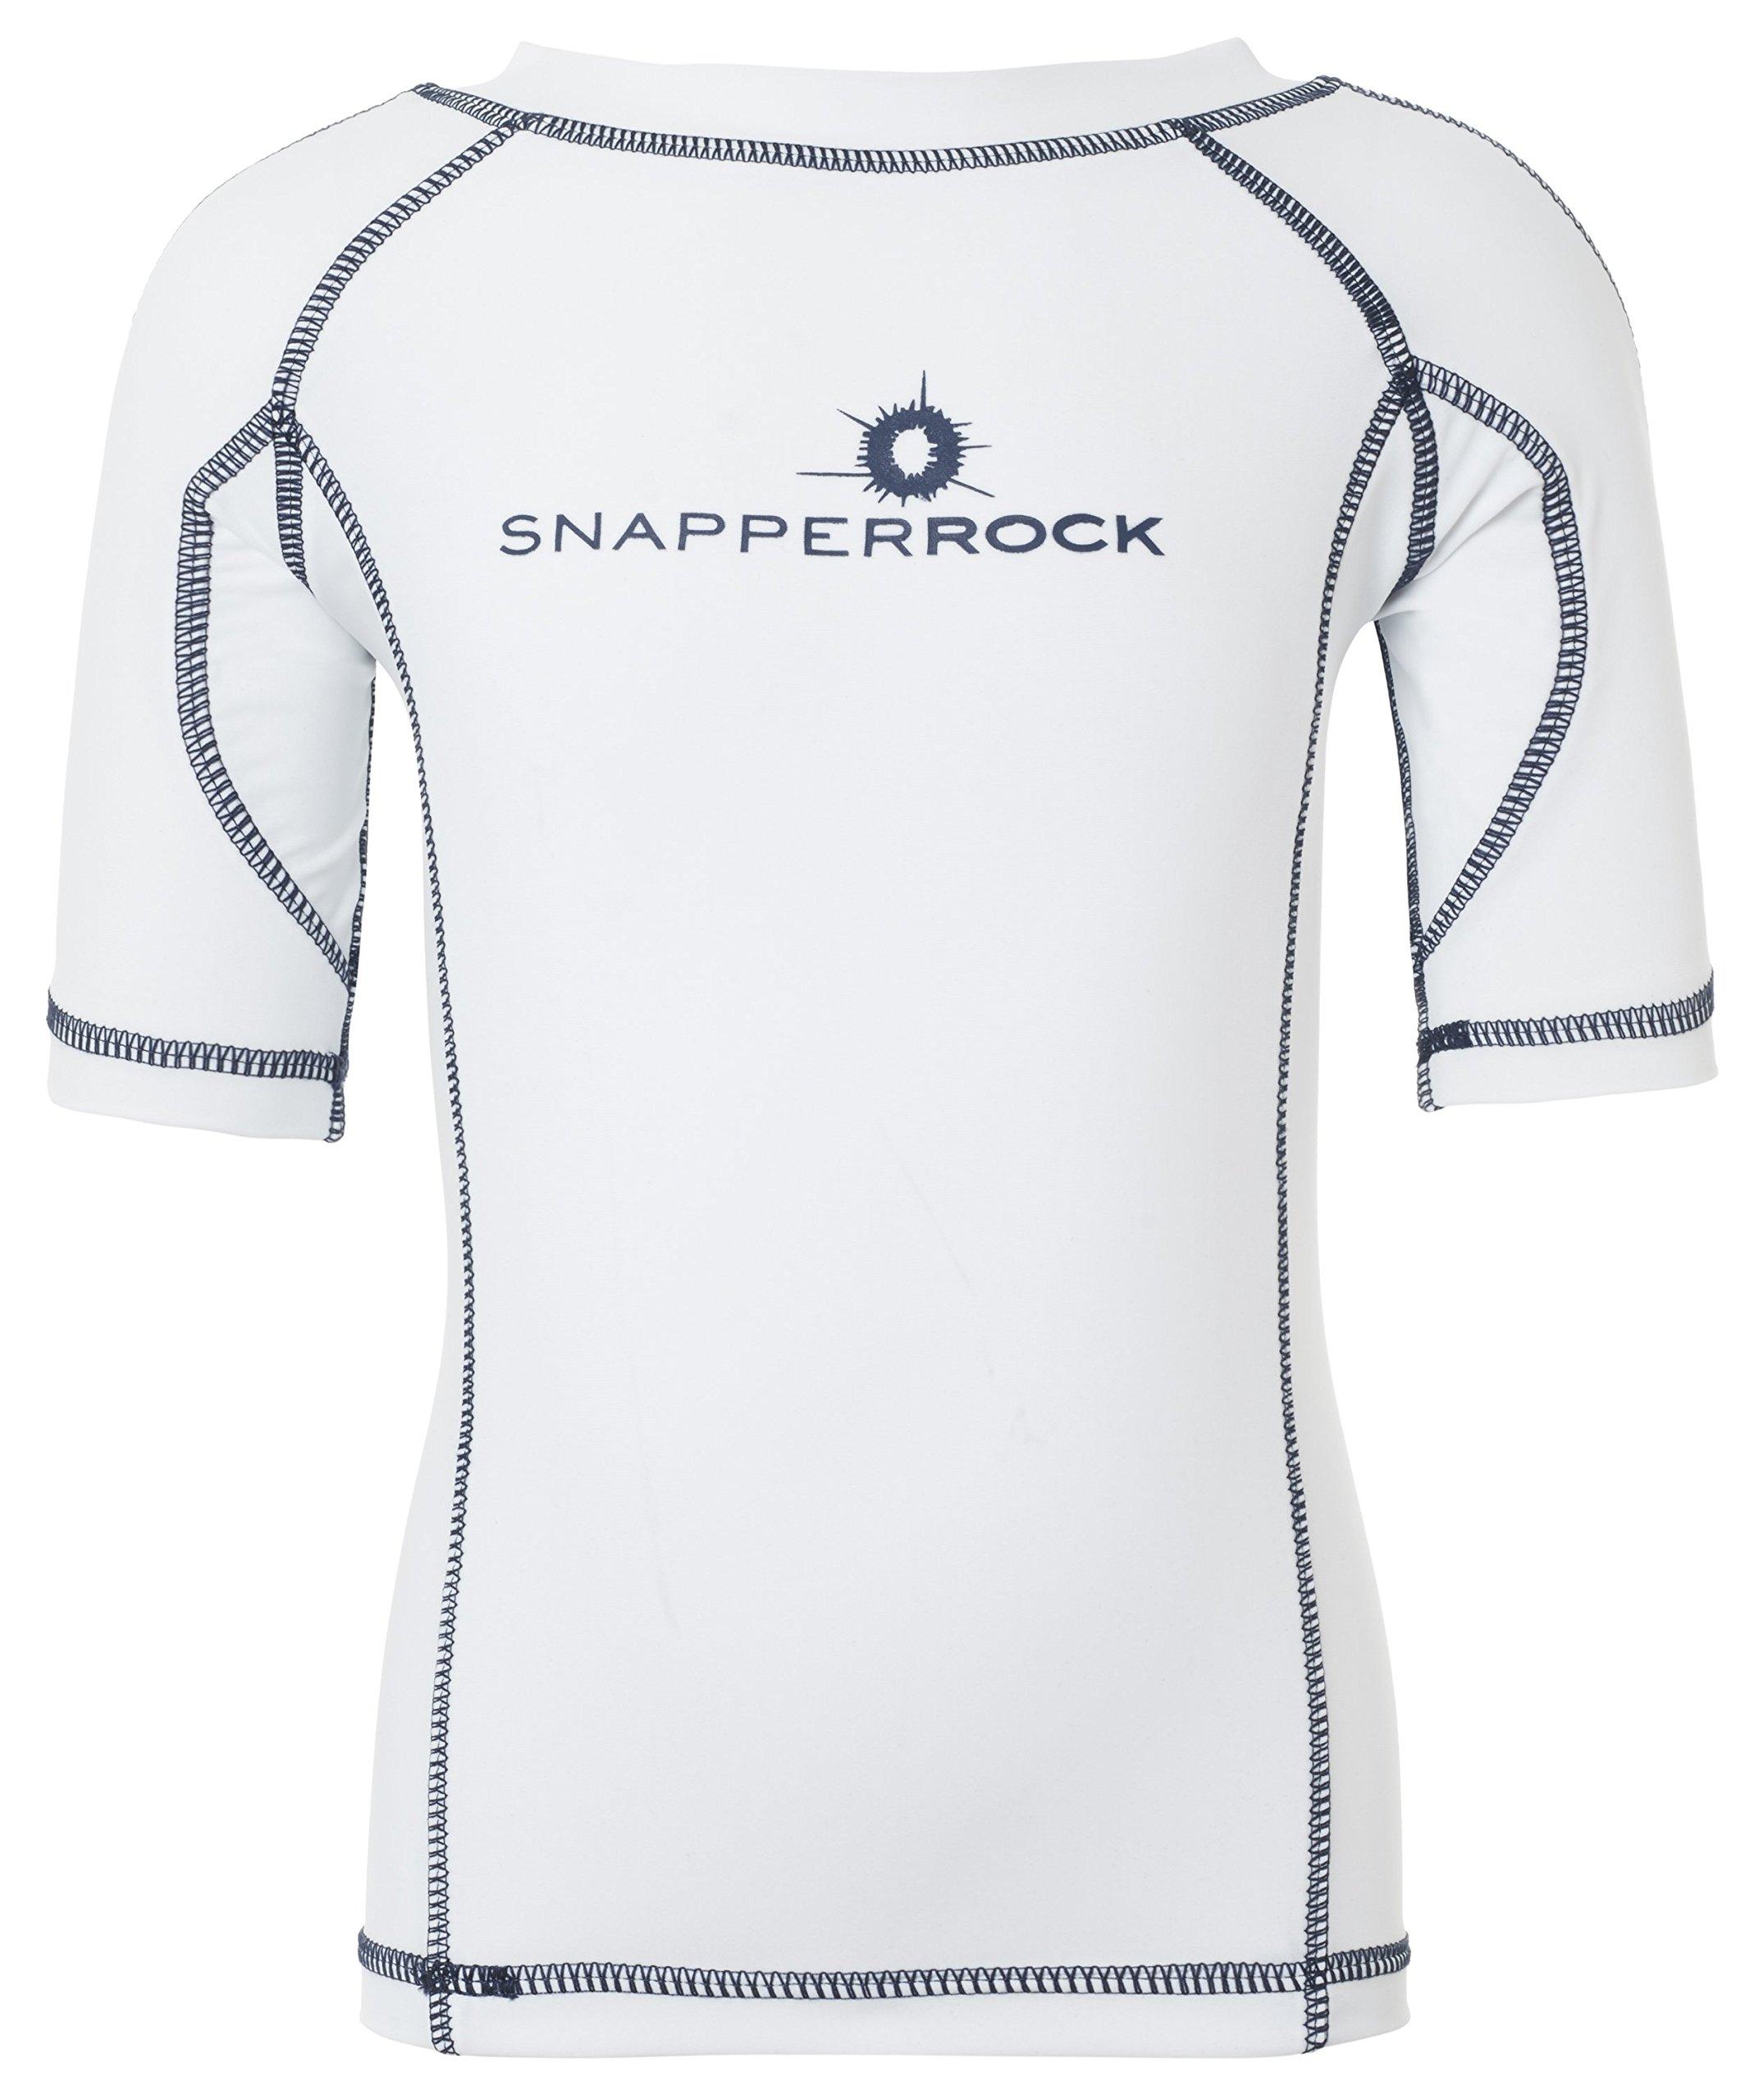 Snapper Rock Big Boys' Solid Rash Top, White, 12